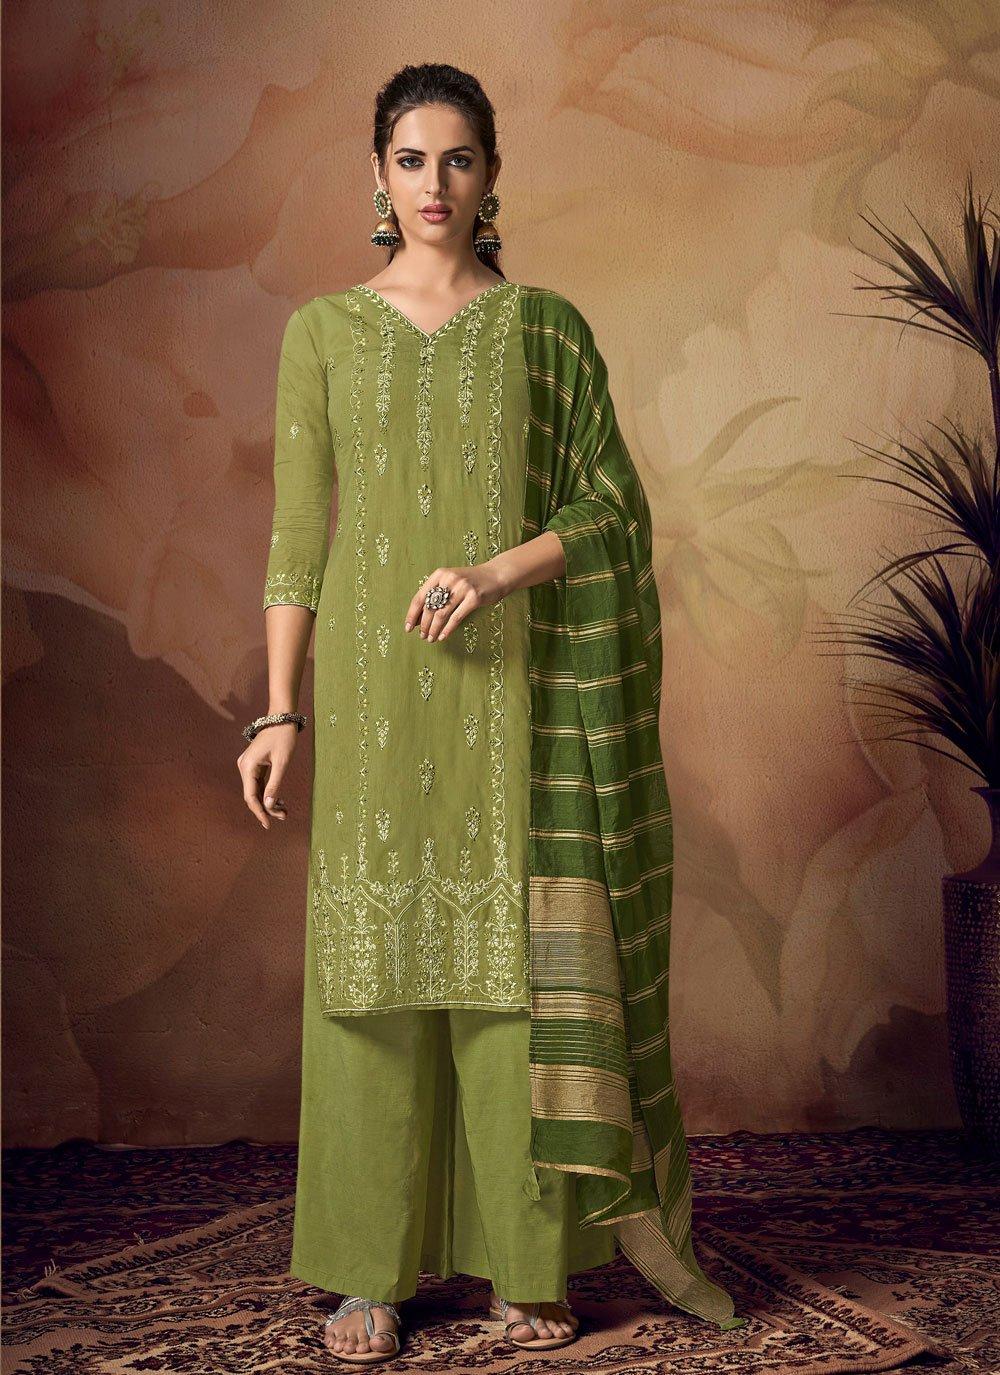 Green Muslin Embroidered Designer Palazzo Salwar Kameez